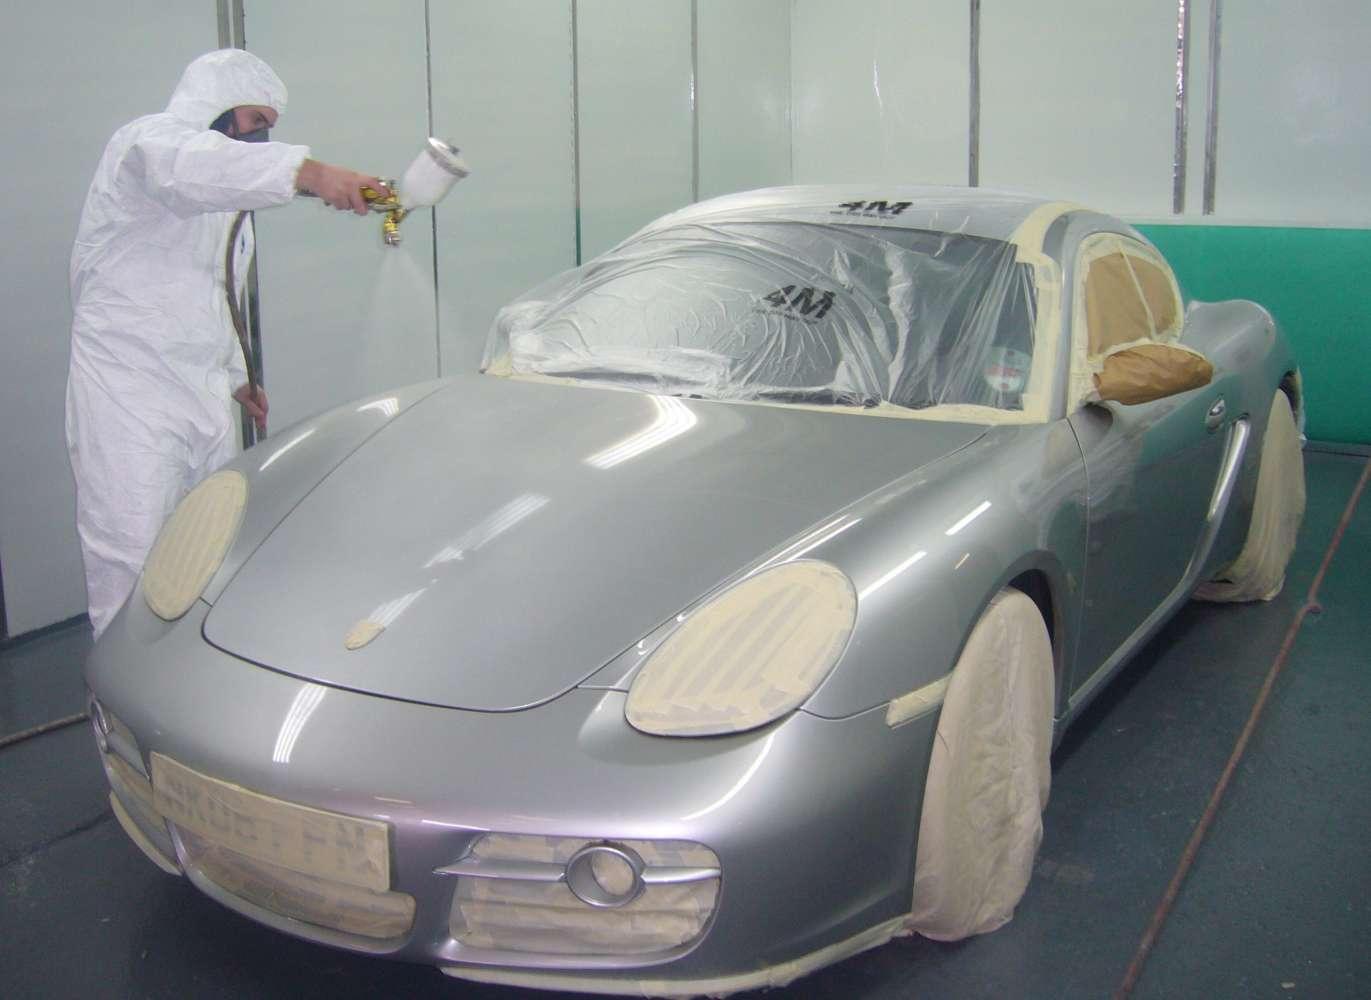 Legal advisory – Procedures discolored paint cars